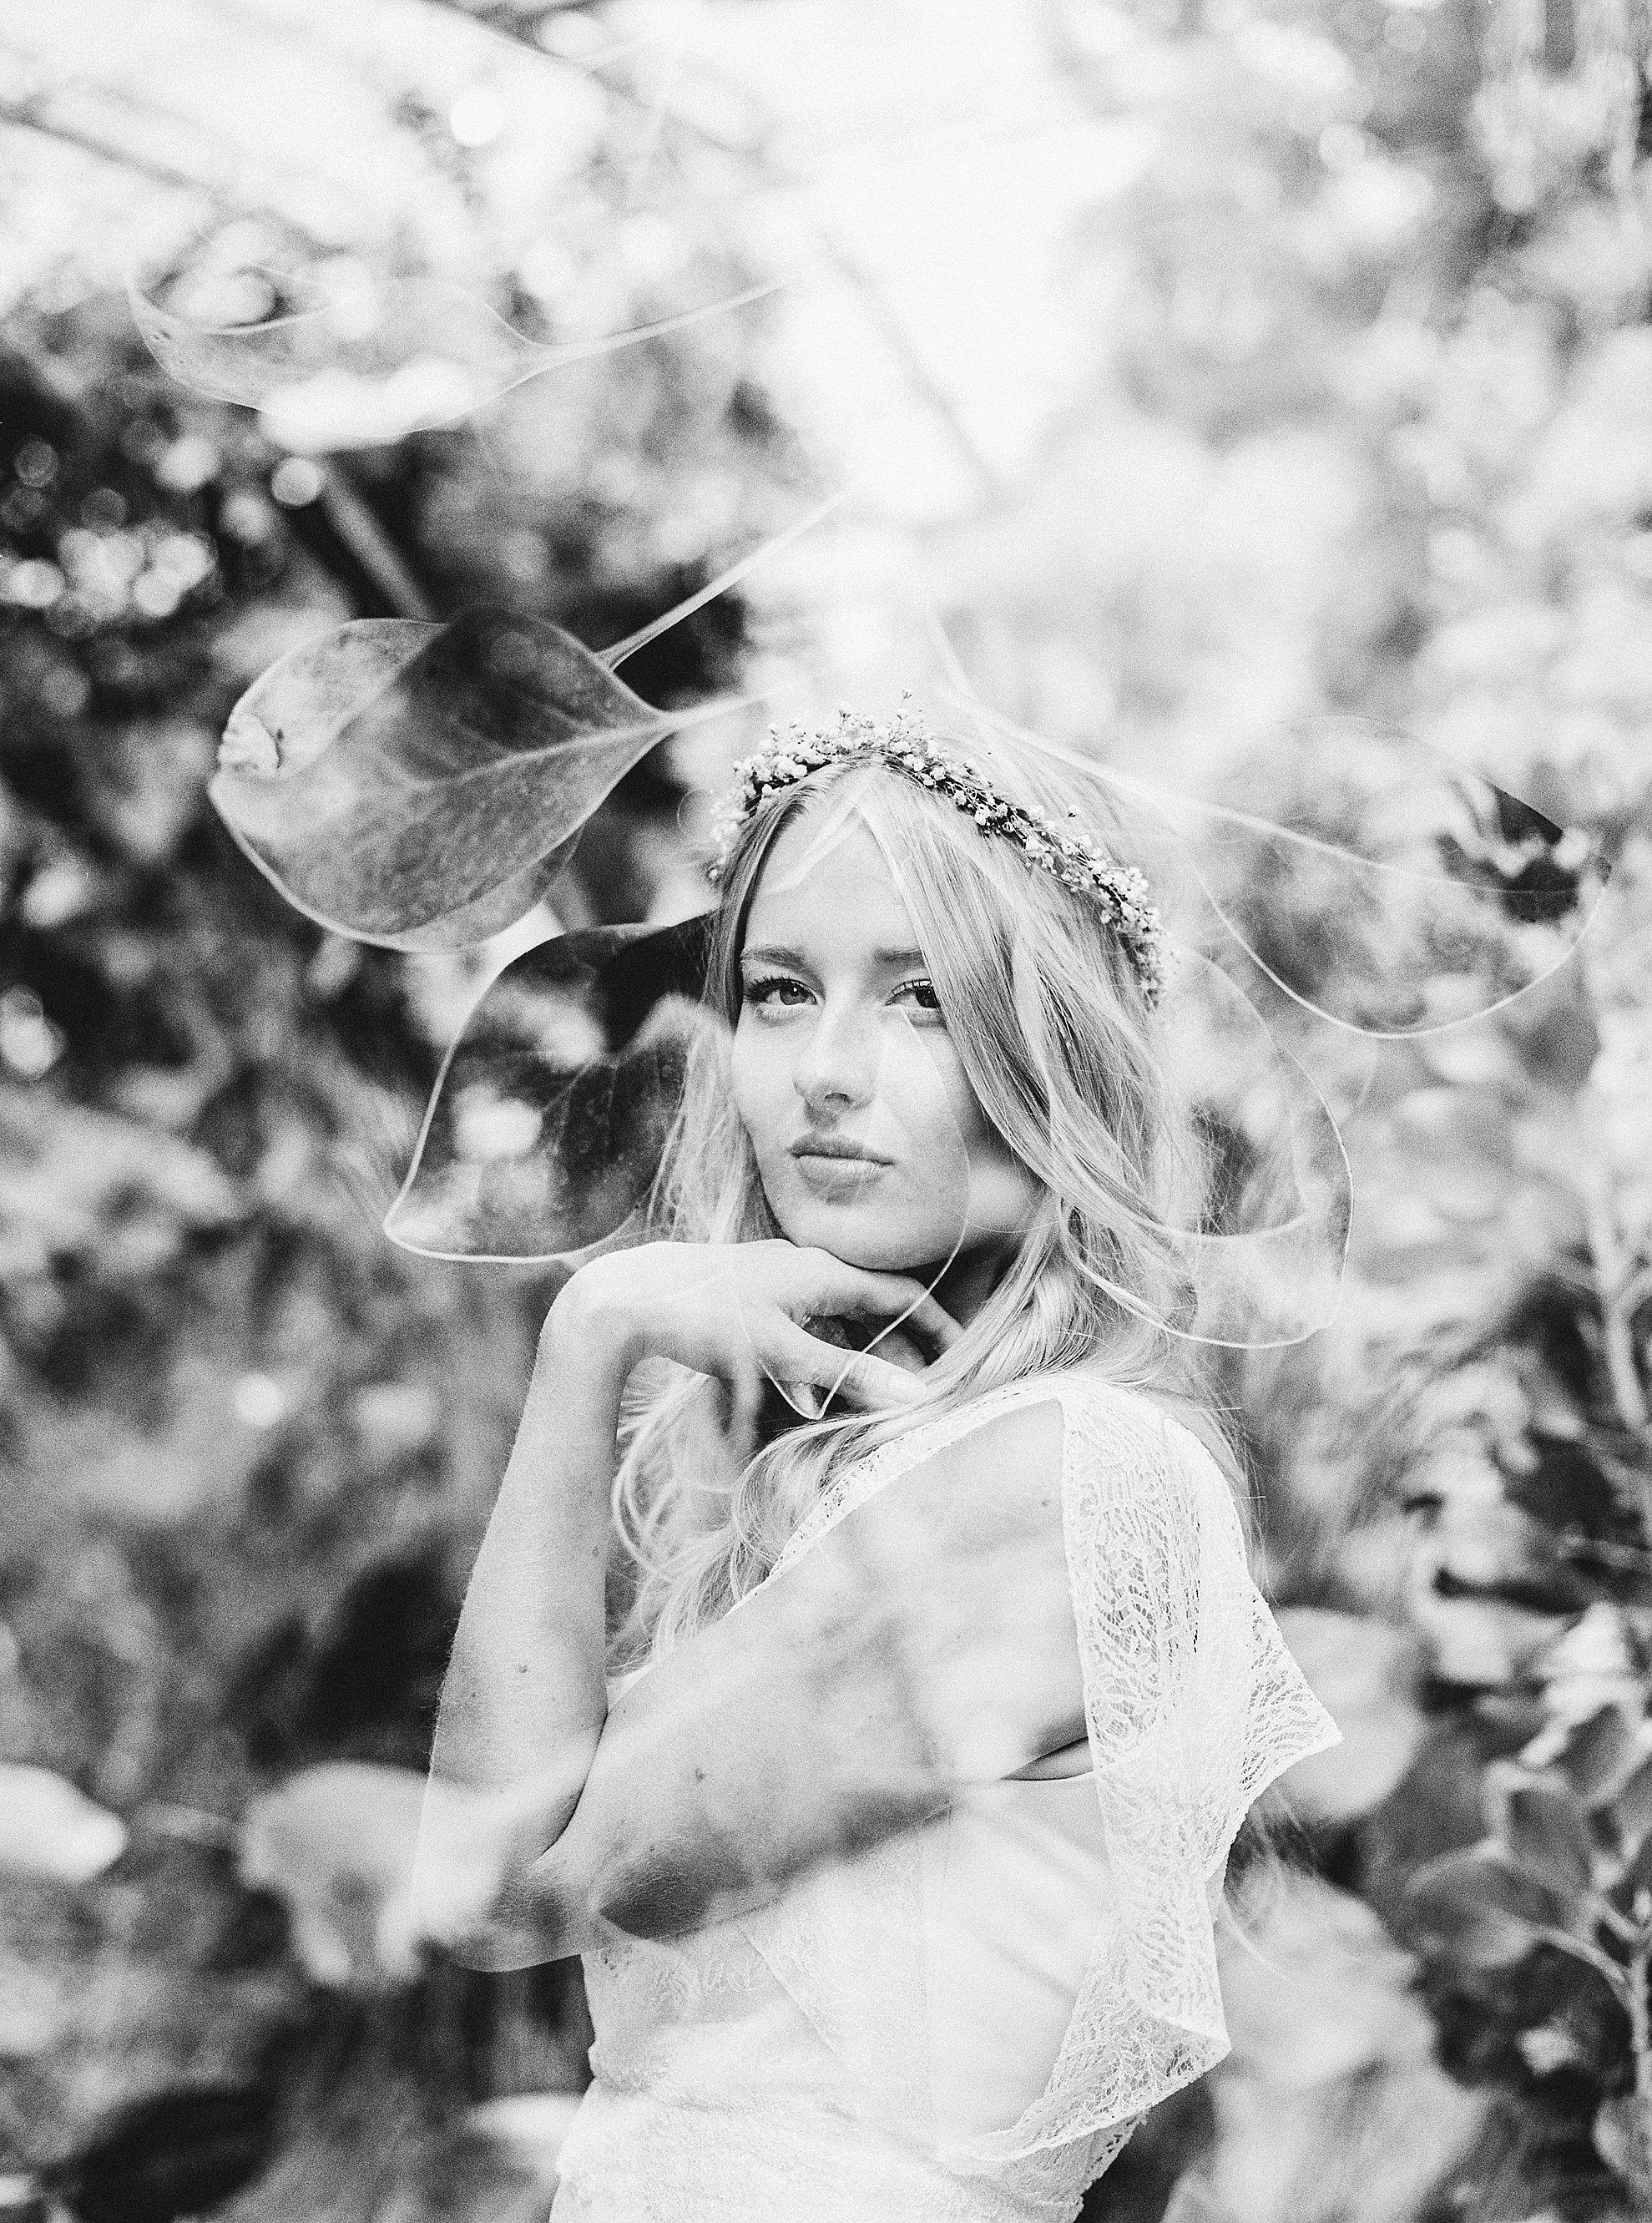 Amanda-Drost-photography-Hortus-Amsterdam-wedding_0010.jpg